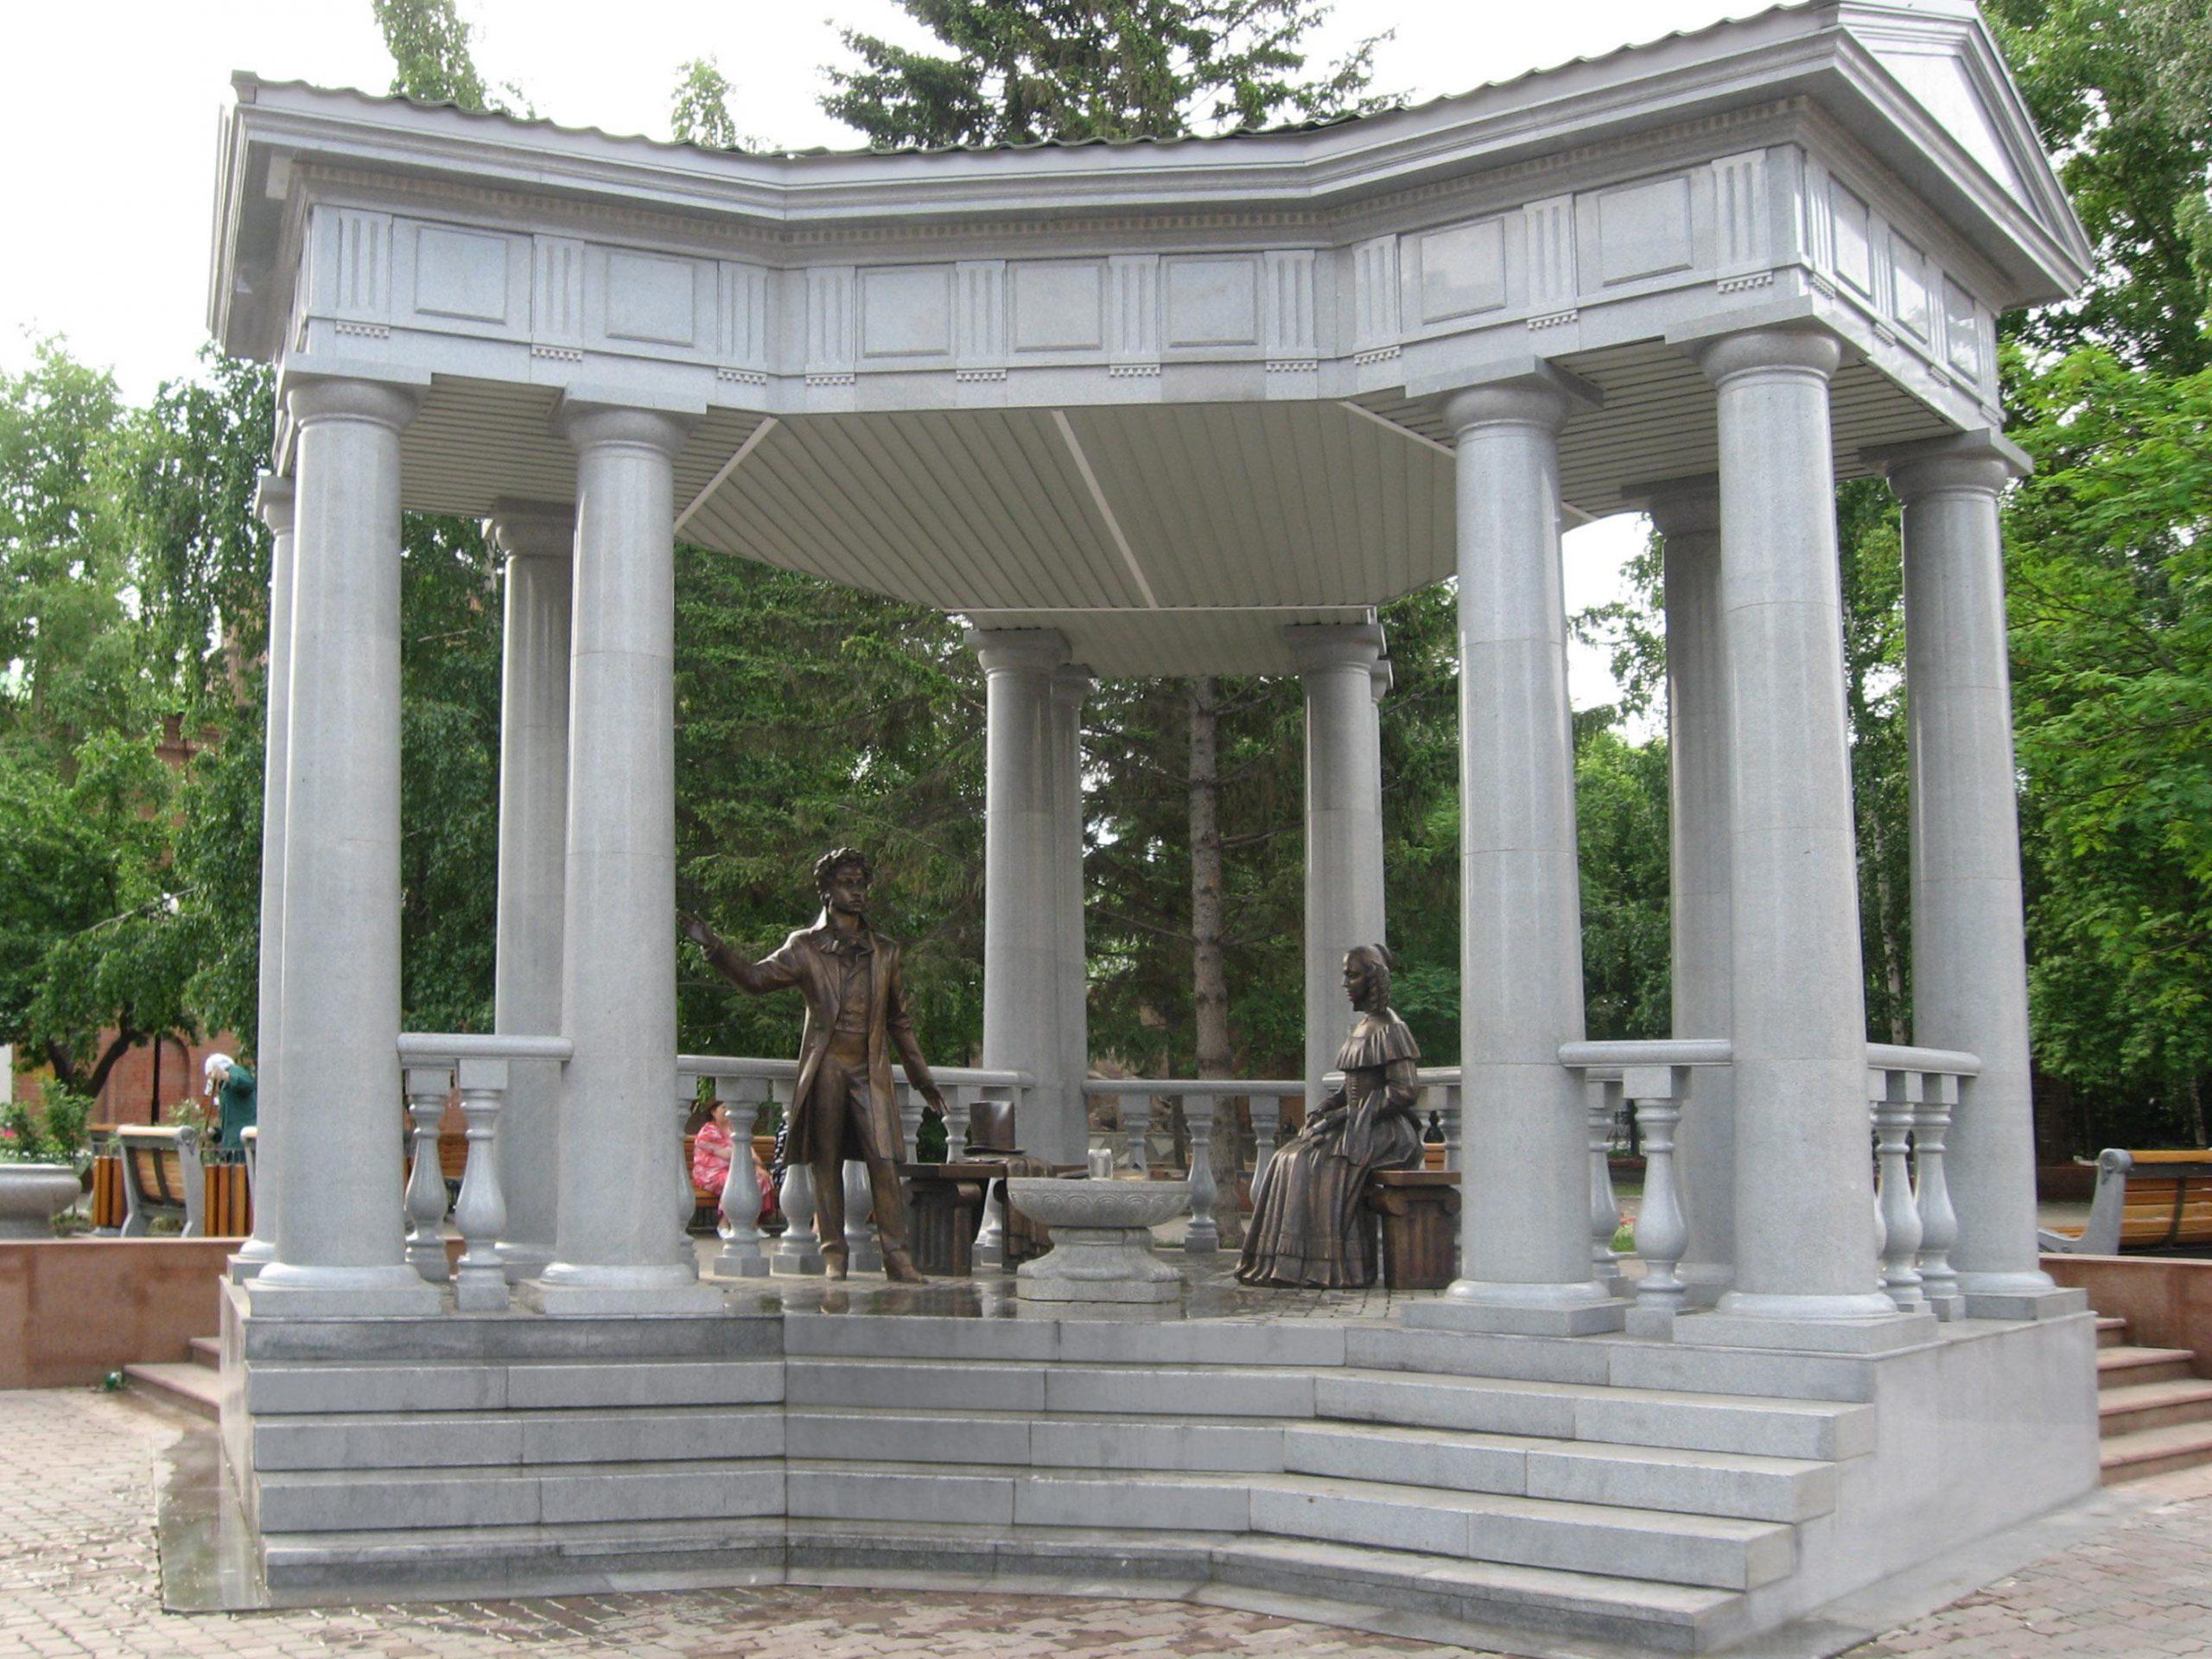 монумент Пушкин и Натали в Пушкинском сквере Красноярска